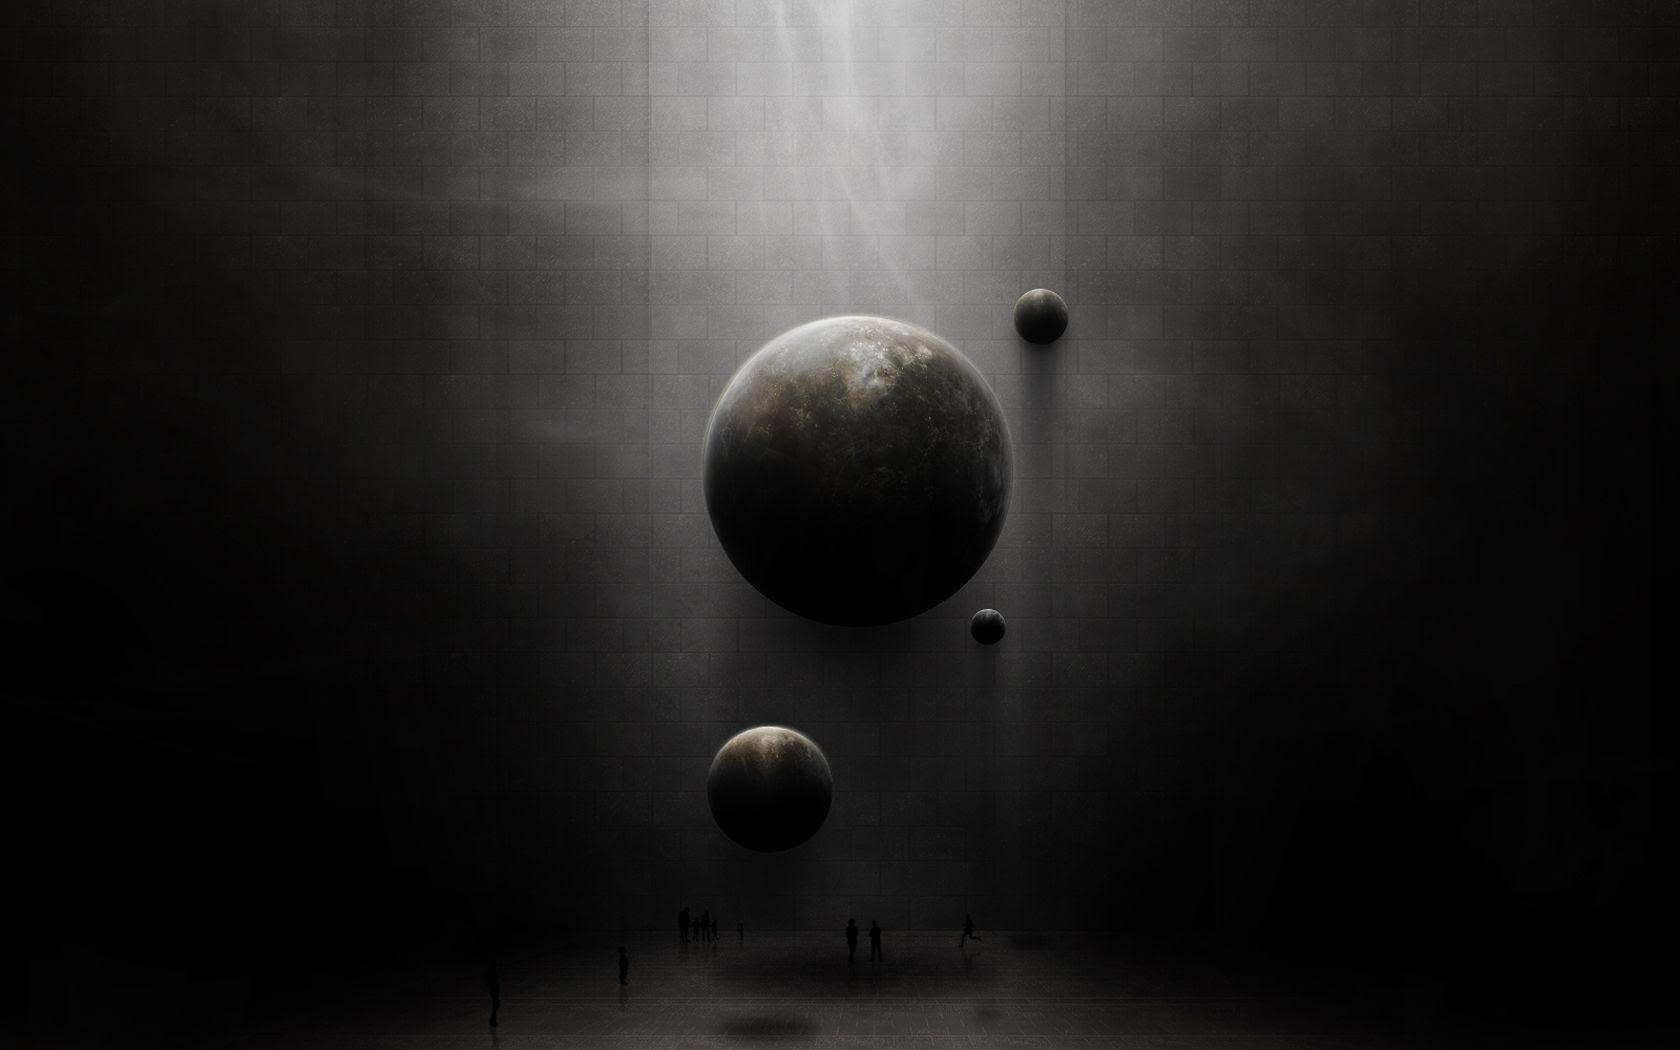 Download 500 Wallpaper Dark Abstract  Terbaru